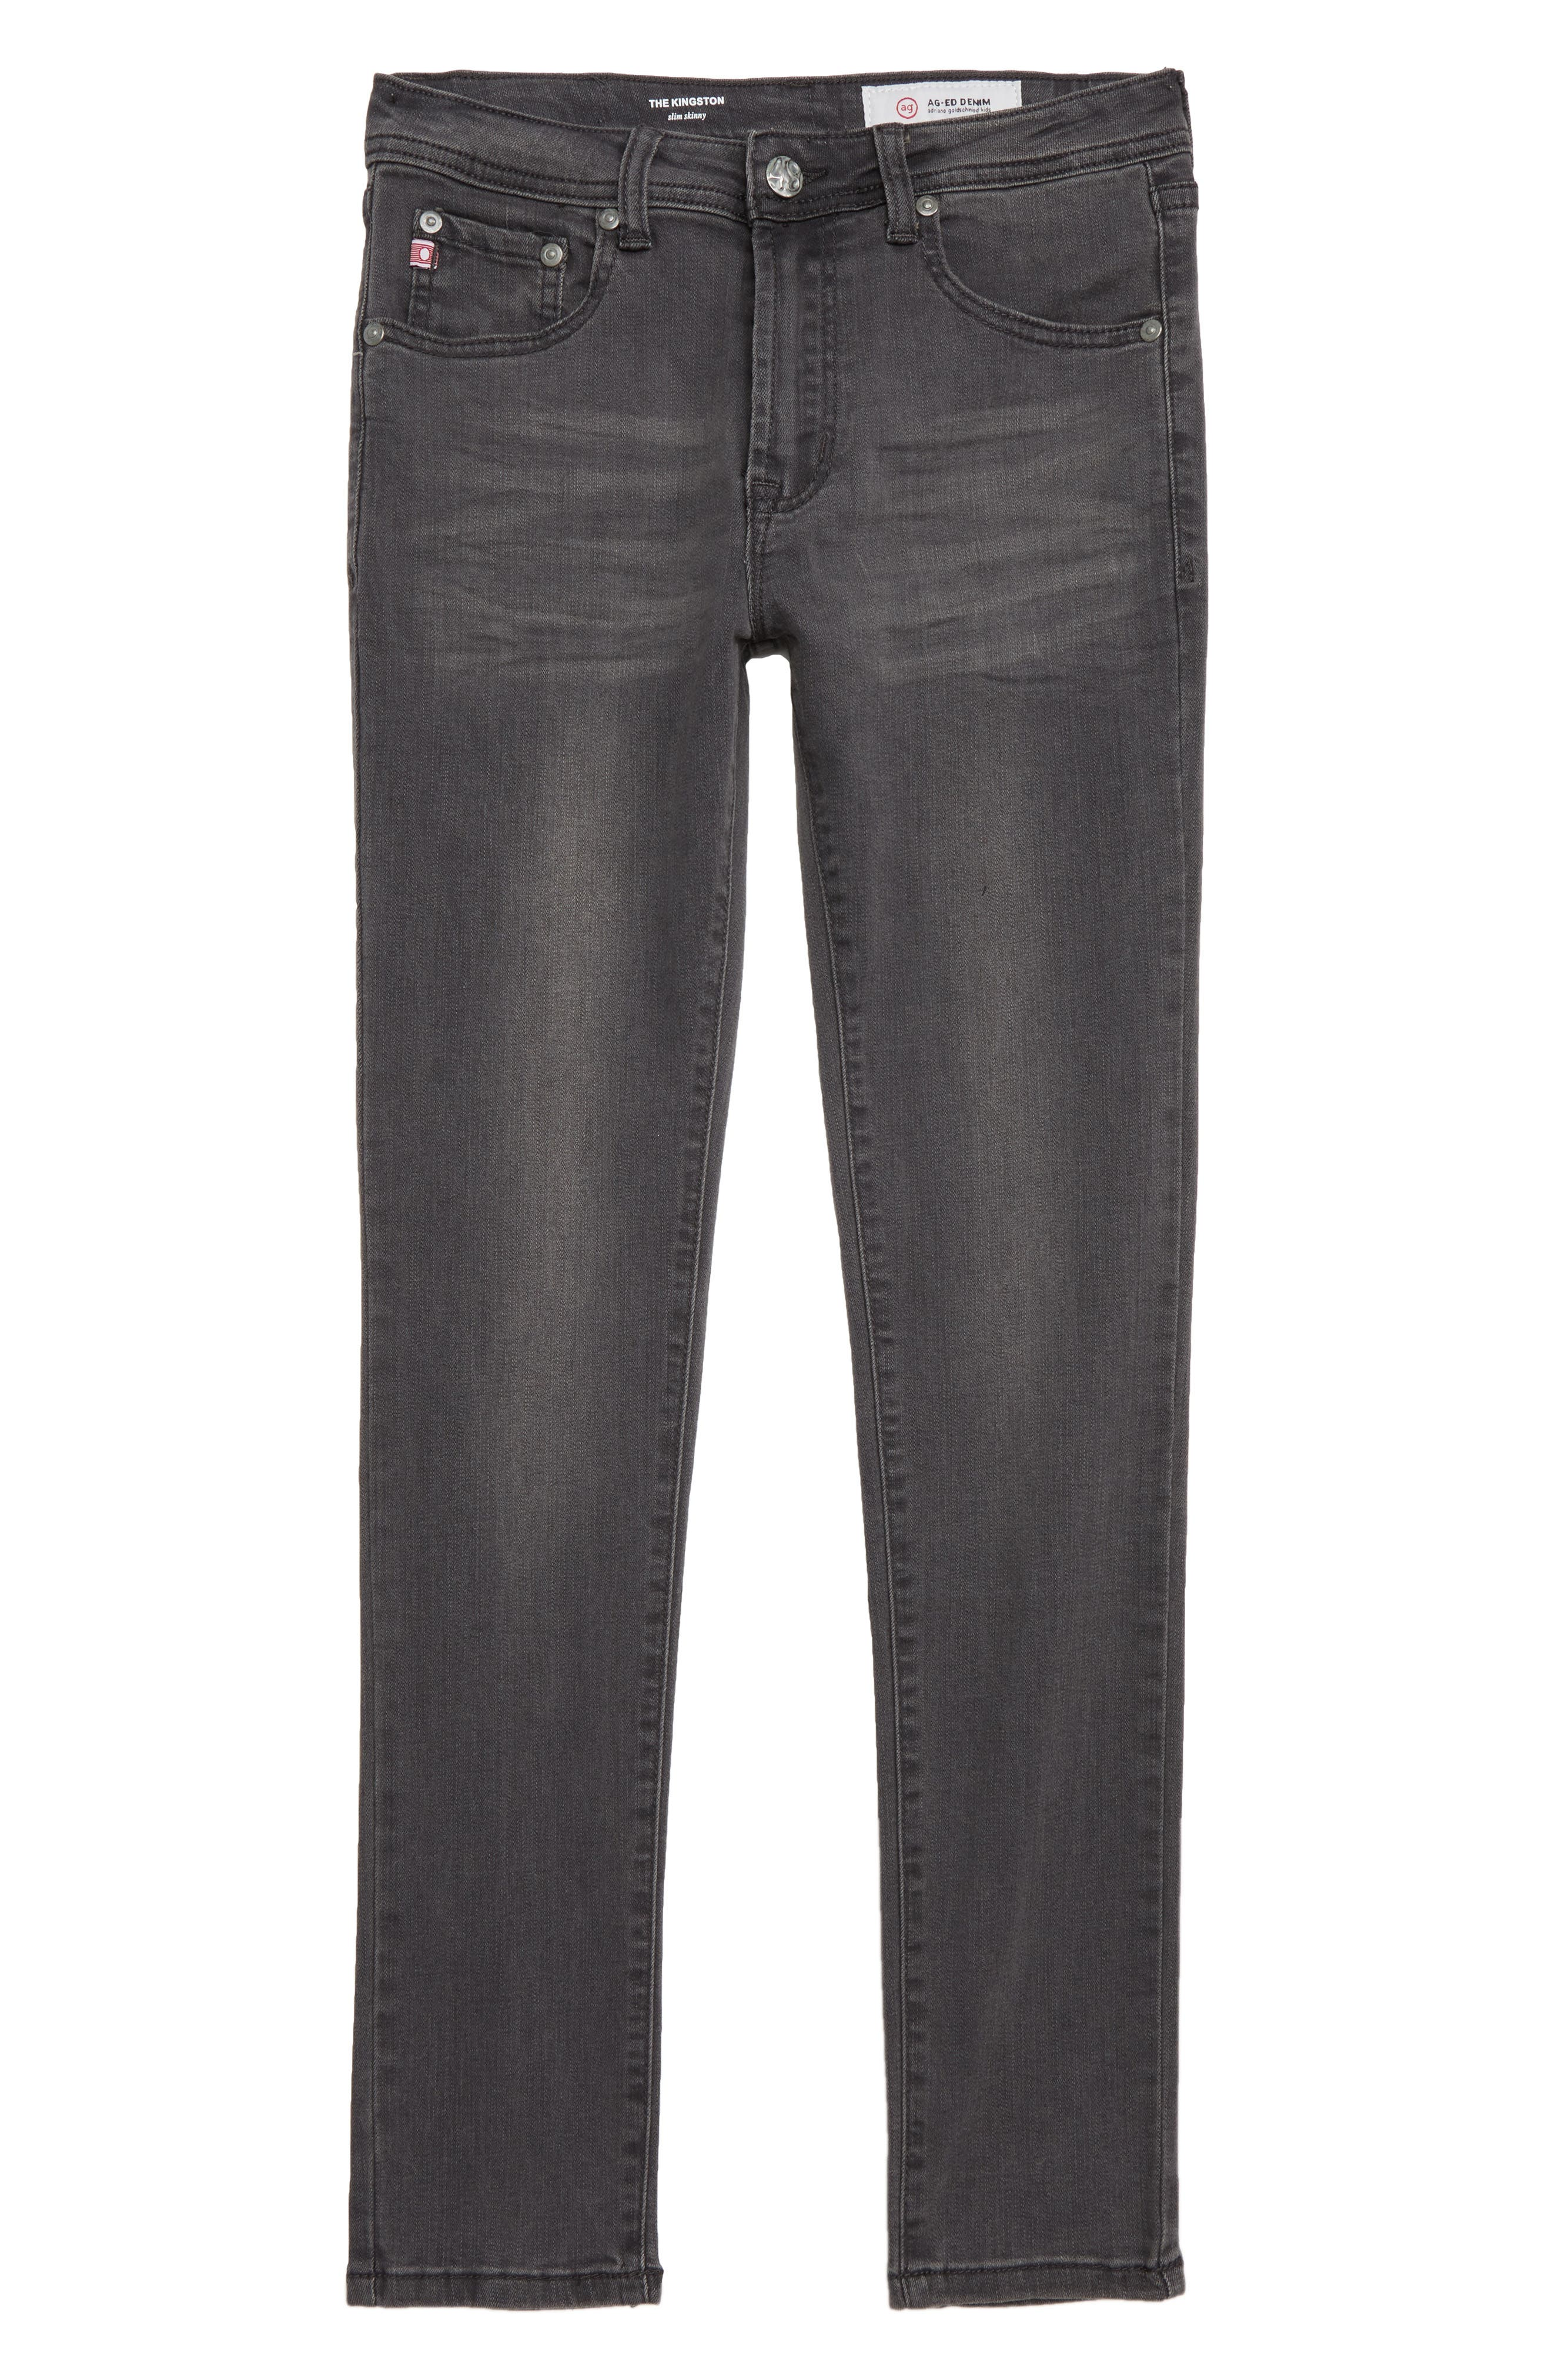 adriano goldschmied kids The Kingston Slim Jeans,                         Main,                         color, FOG GREY